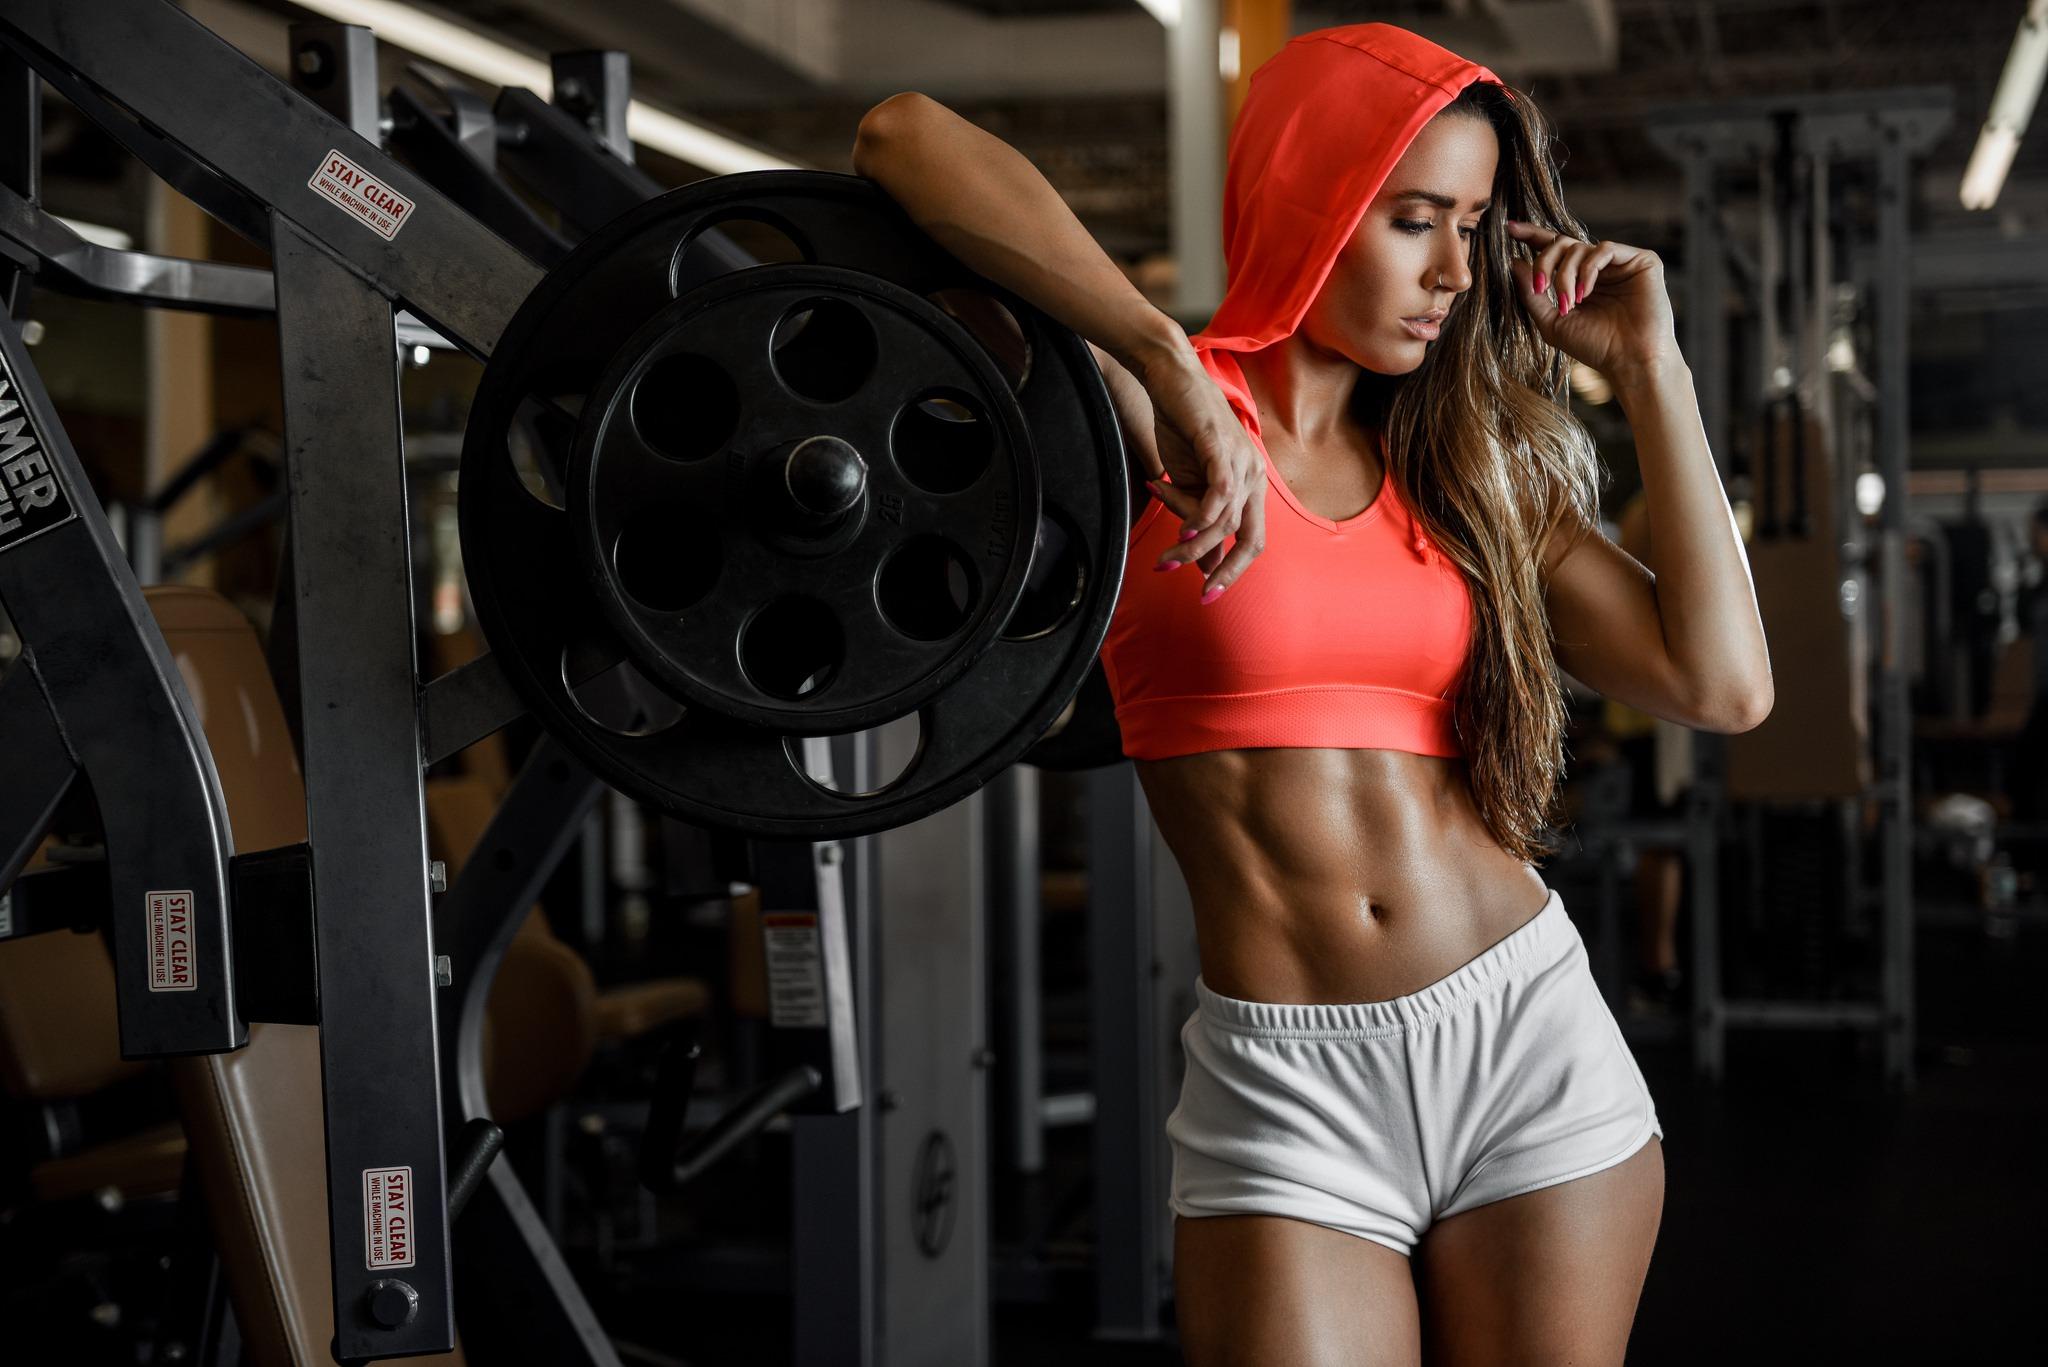 как девушки и фитнес фото приходите, посмотрите купите